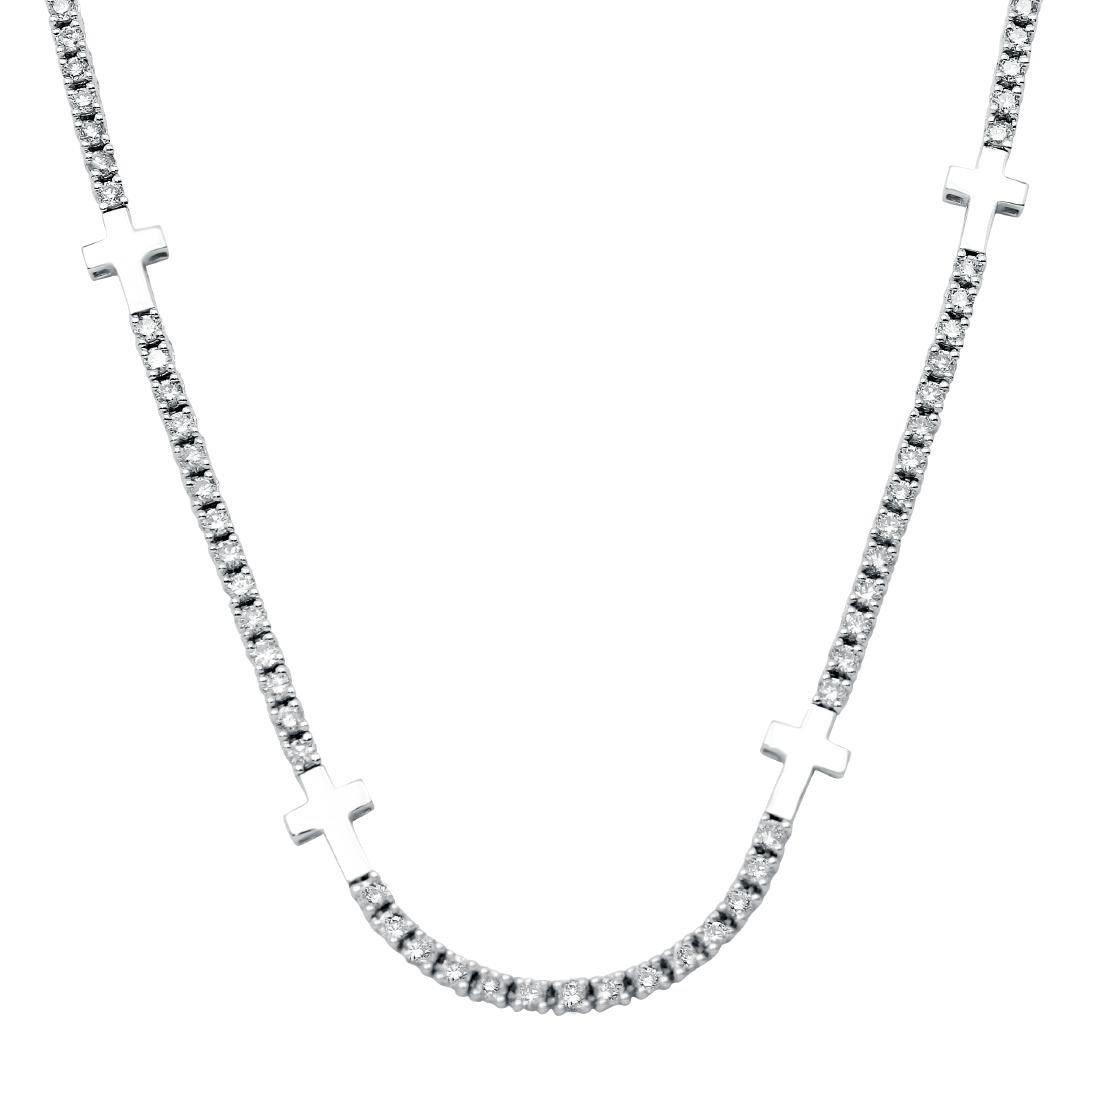 3.08 CTW Diamond Necklace 18K White Gold - REF-182M4F